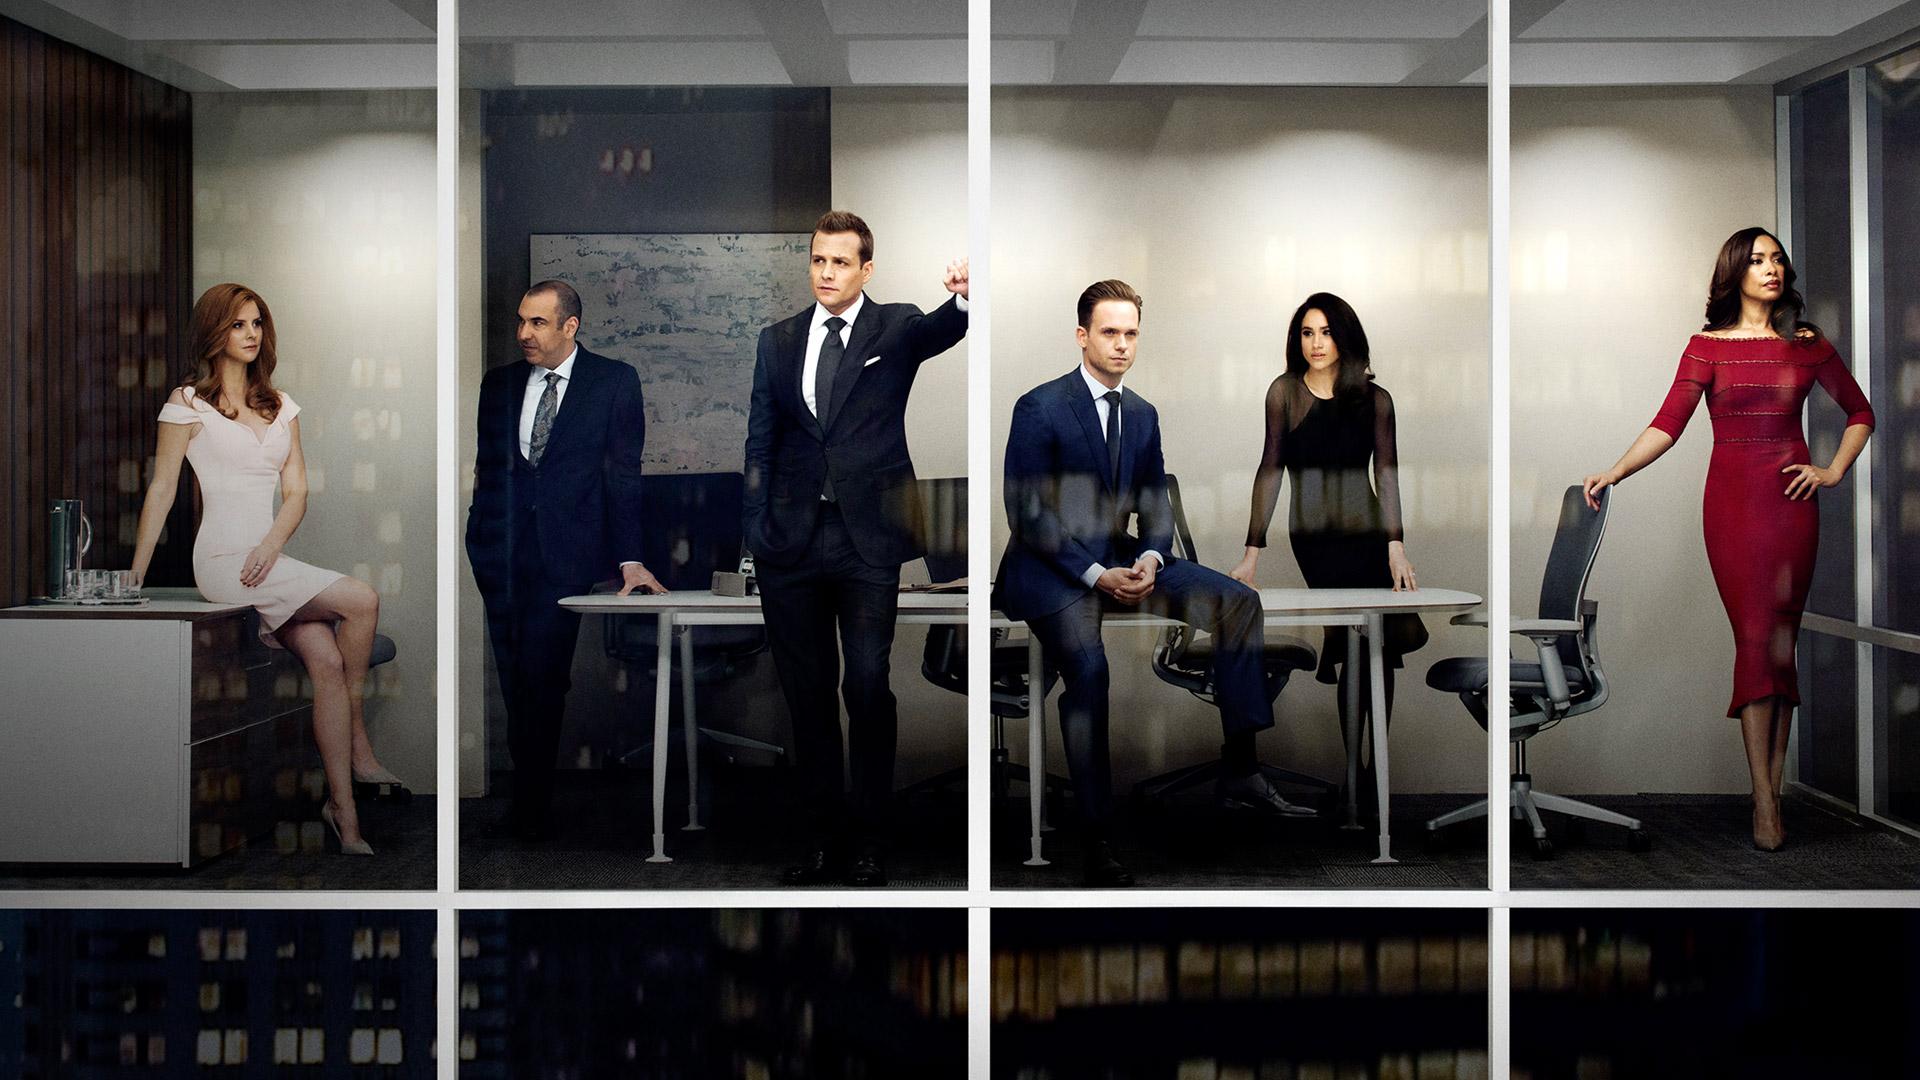 Suits Tv Show Wallpaper